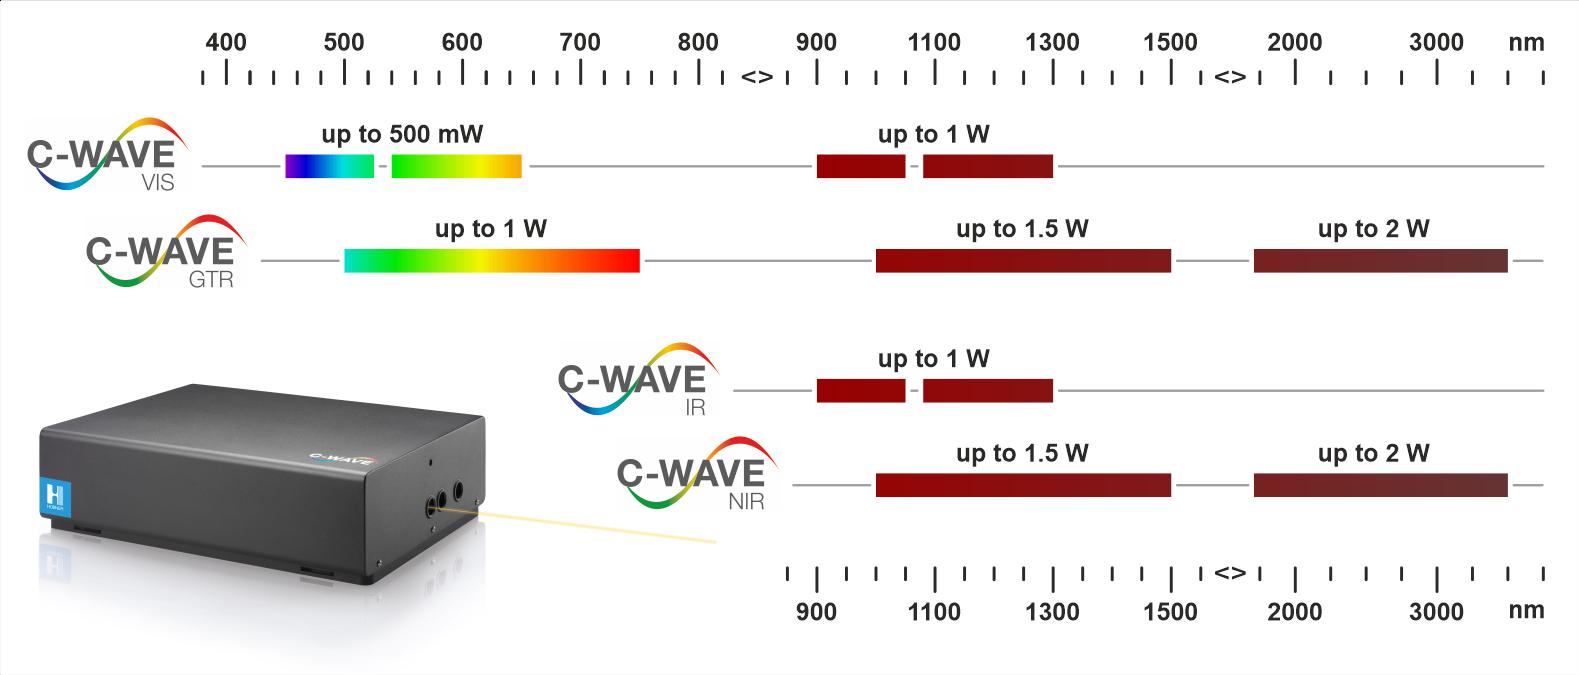 C-WAVE tuning range